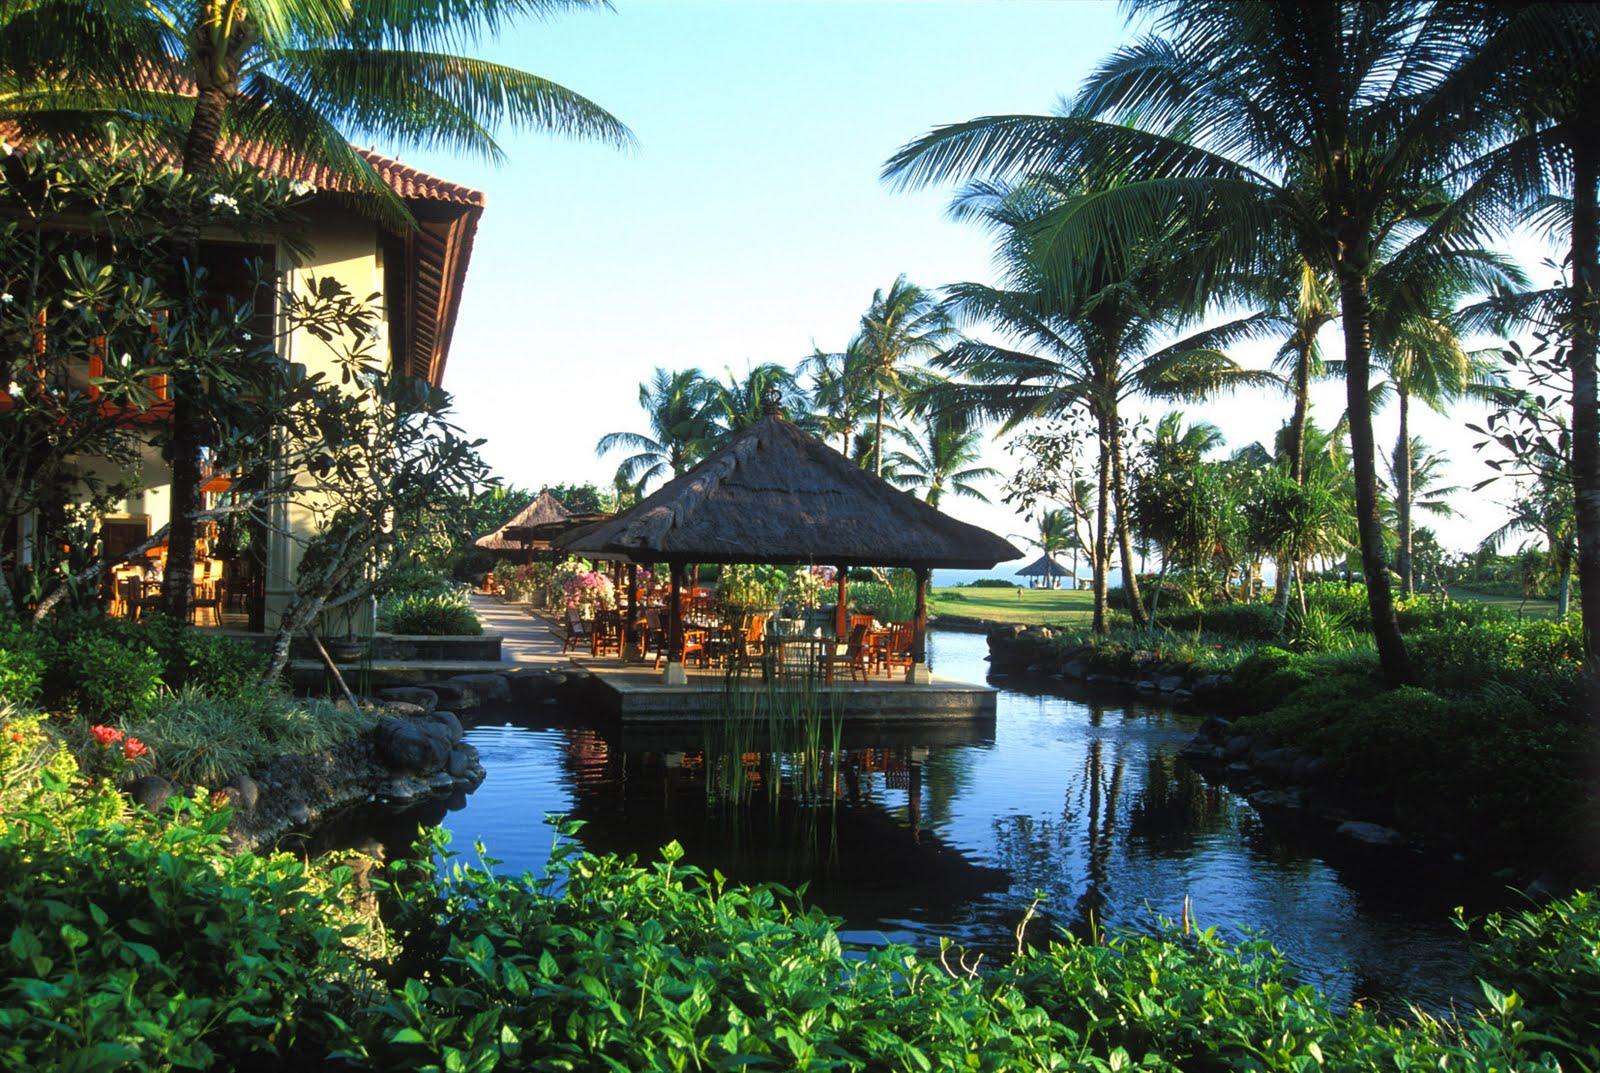 Arneldini Nirwana Bali Resort Menjadi Resor Terpadu Pertama Dari